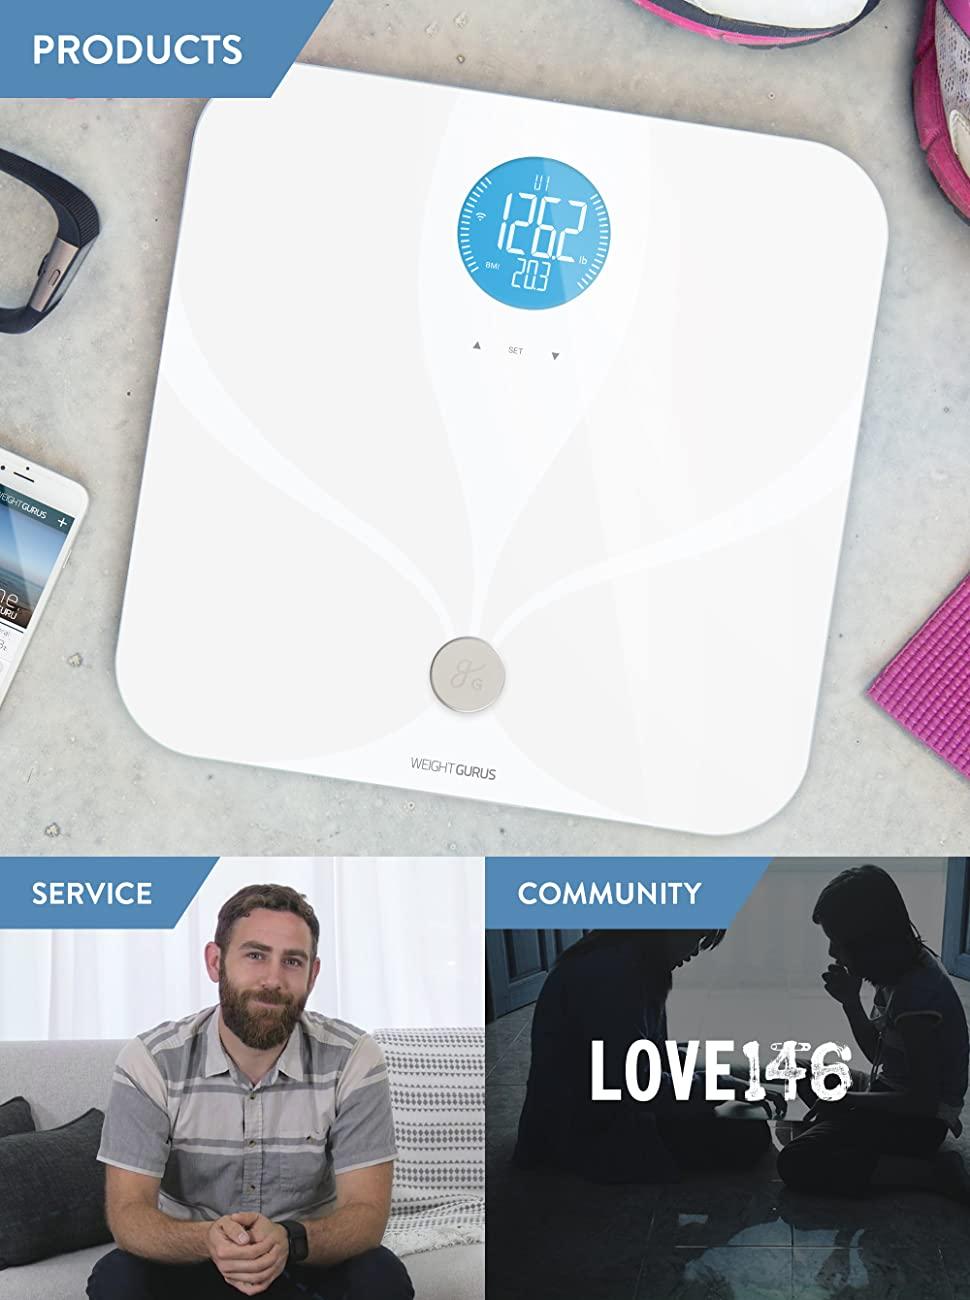 weight gurus wifi smart scale review